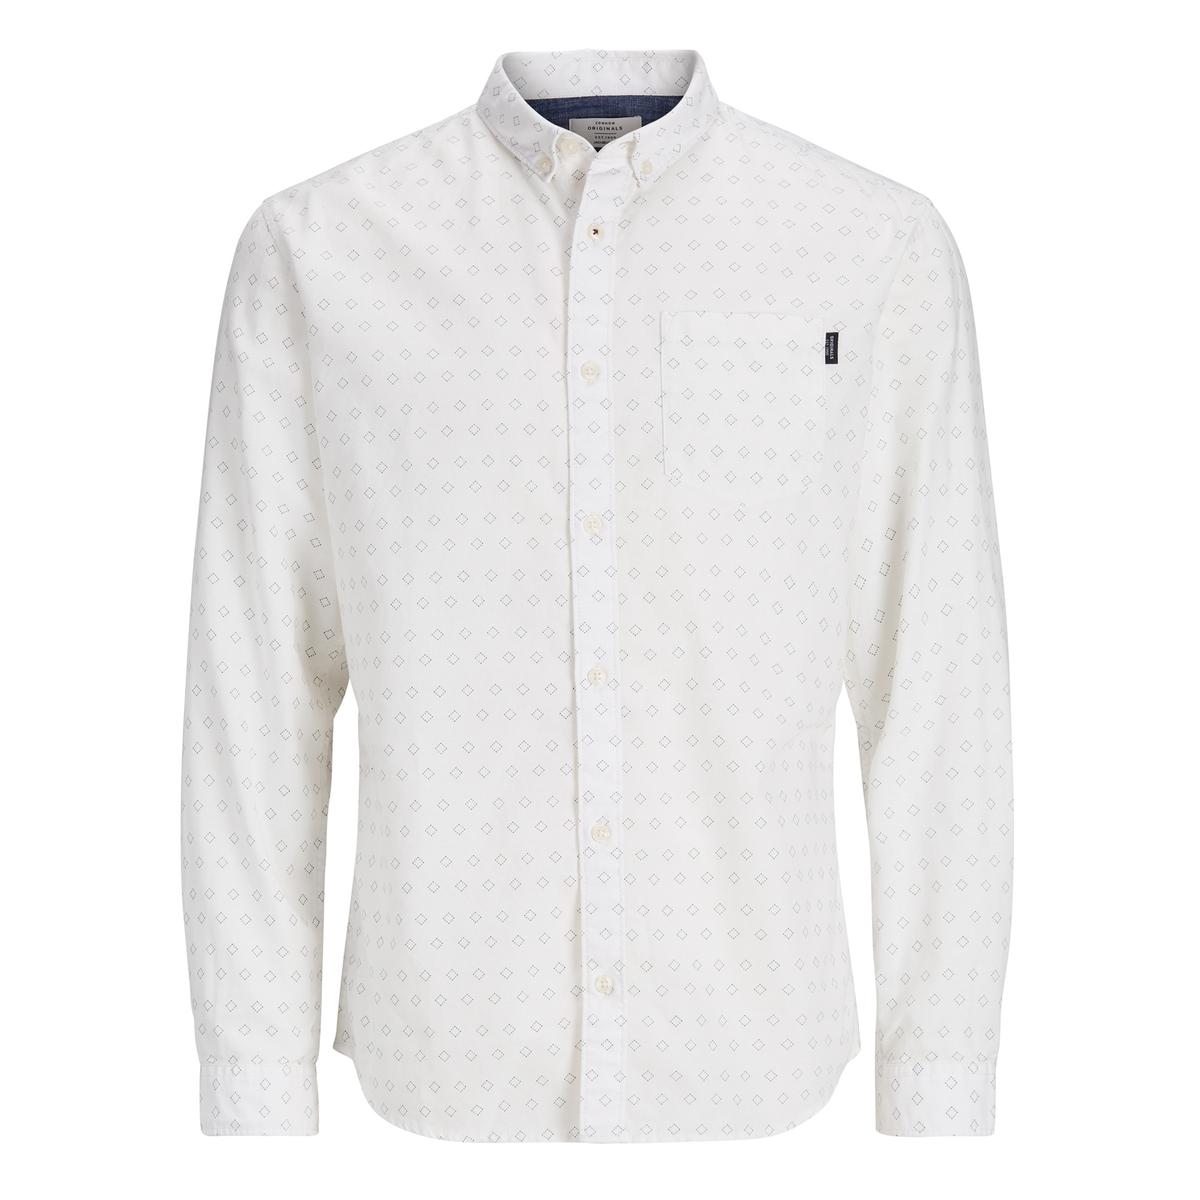 Рубашка с рисунком и длинными рукавами наволочка с рисунком jack